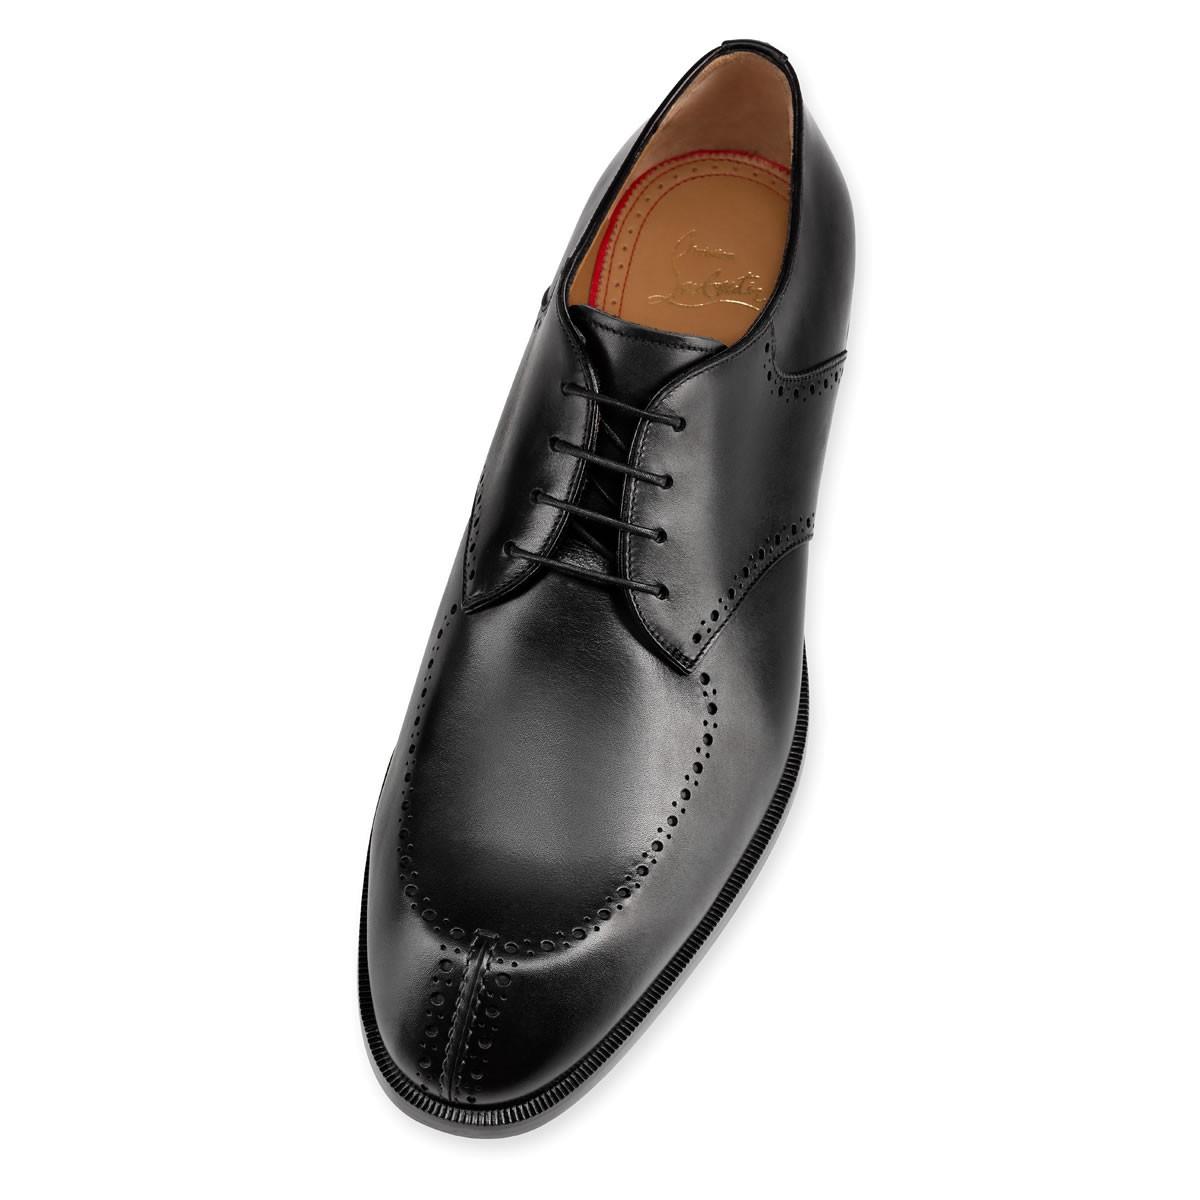 鞋履 - A Mon Homme Flat - Christian Louboutin